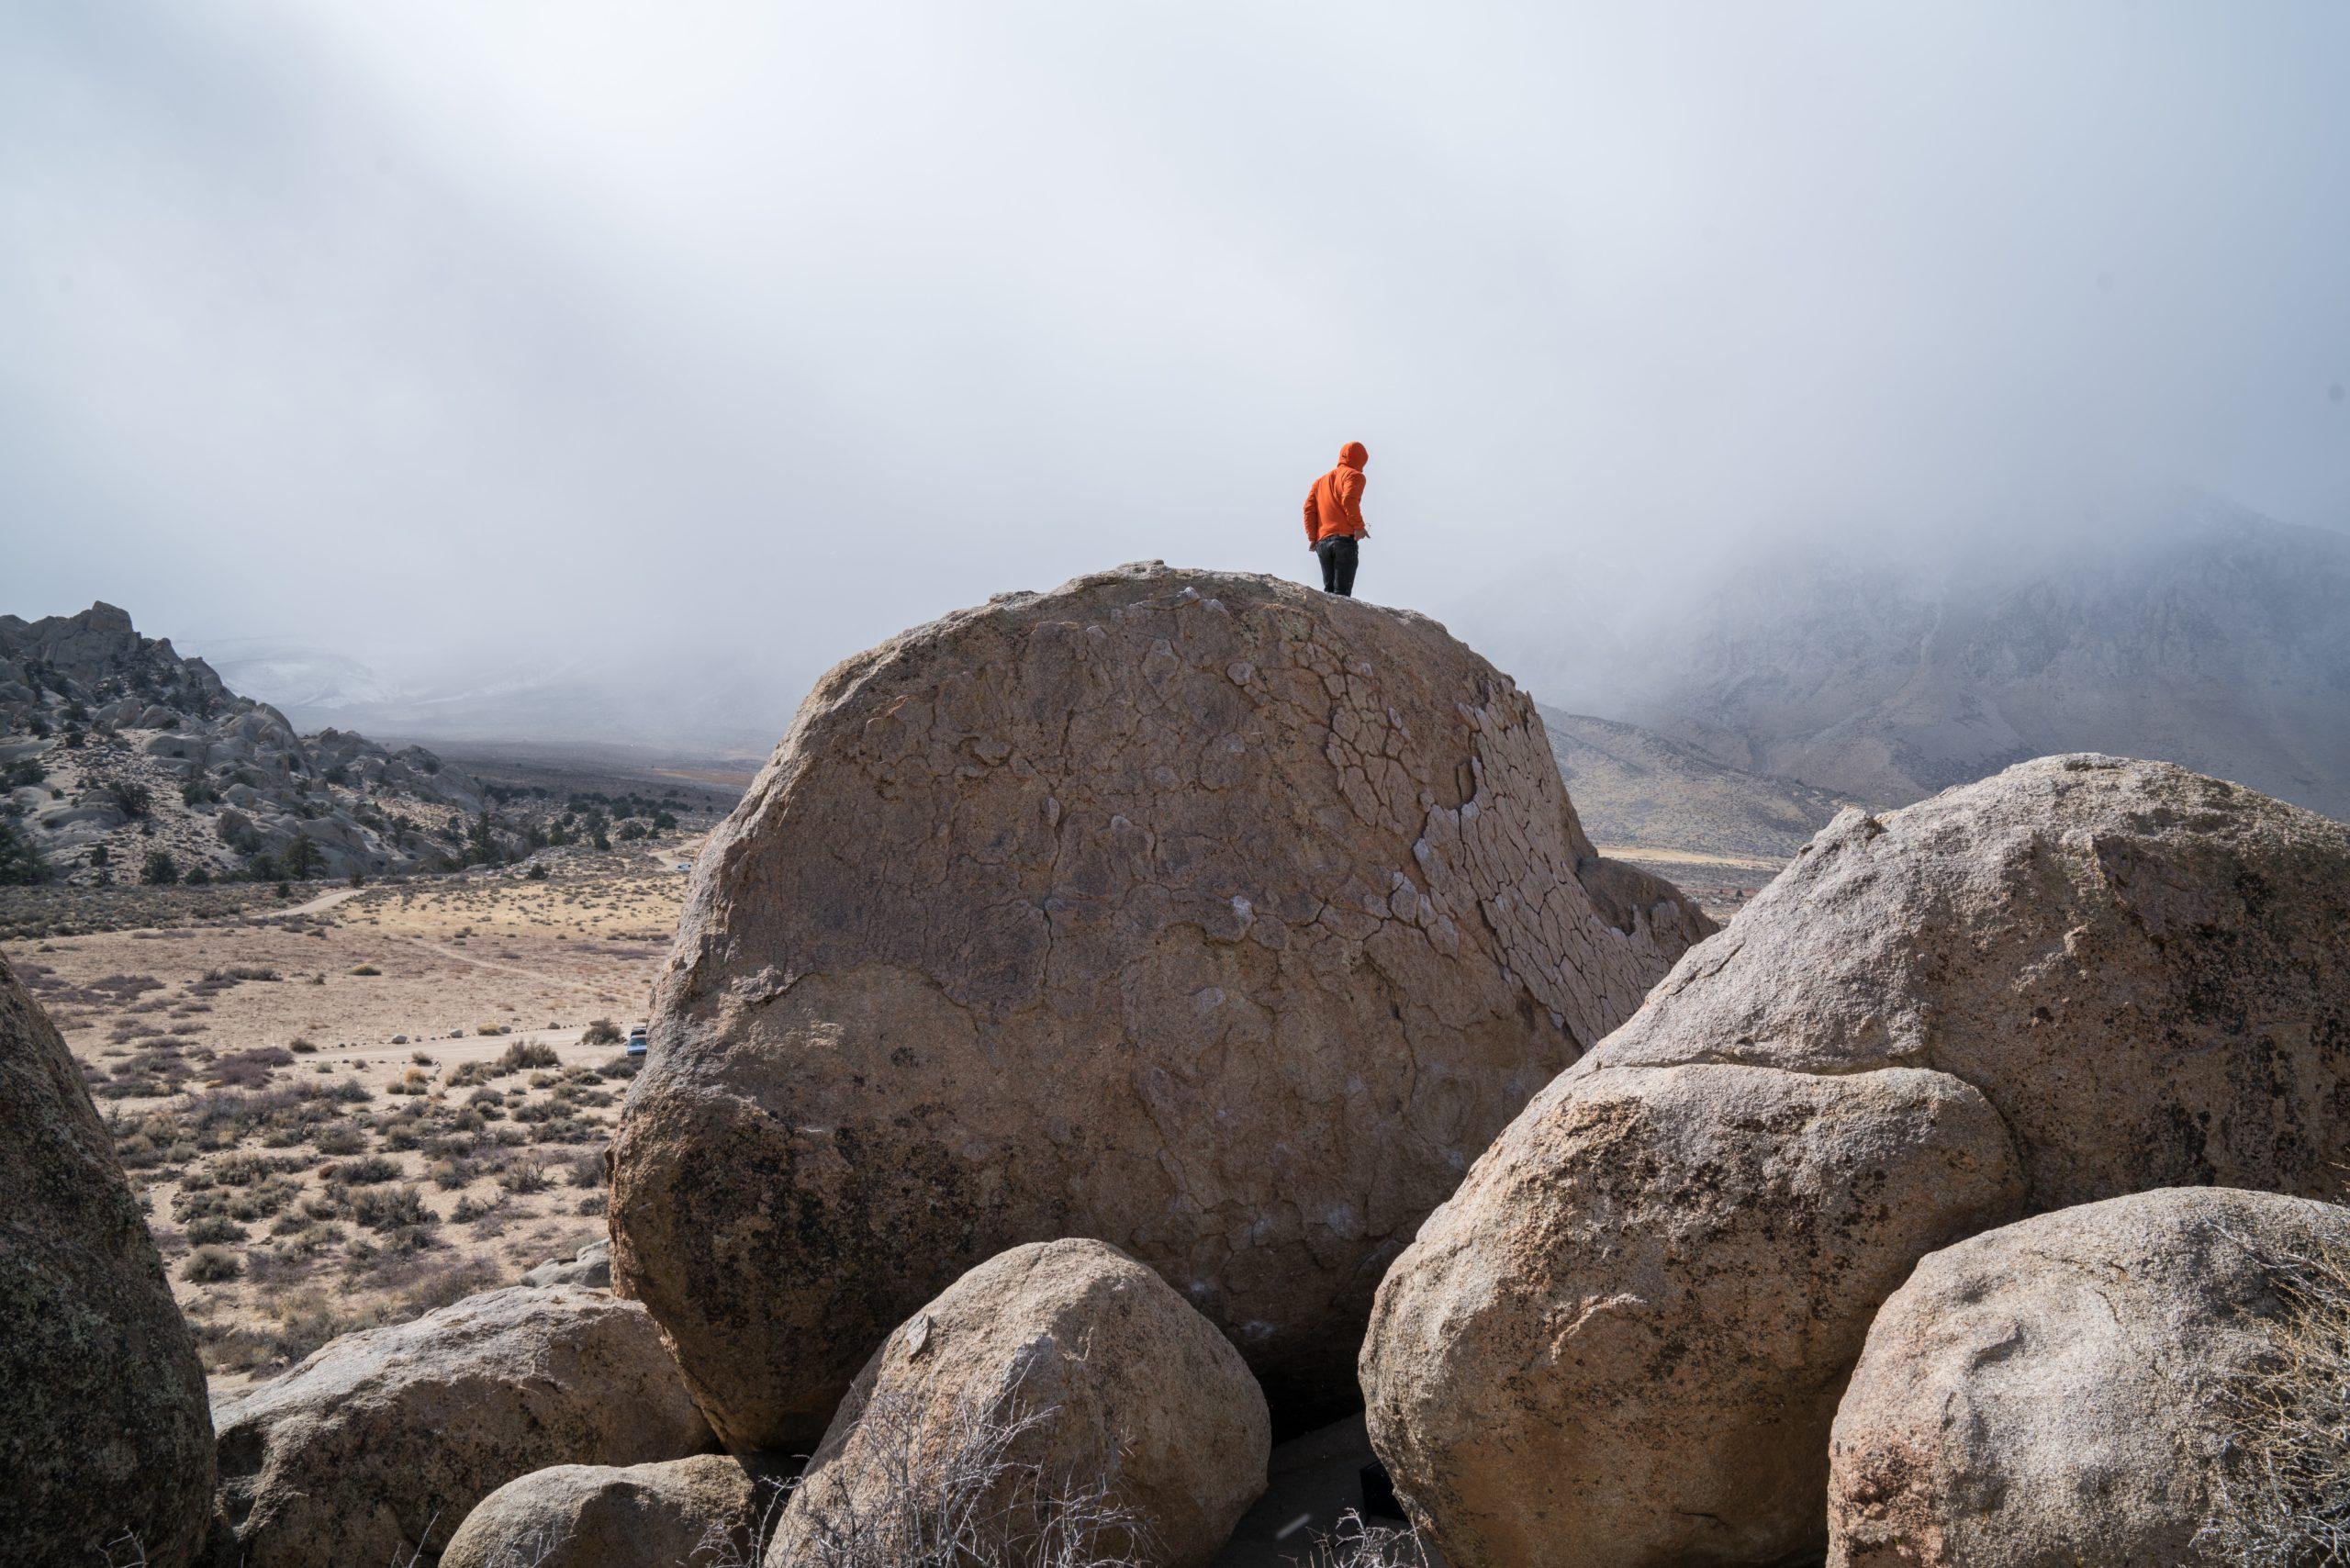 A bouldering rock